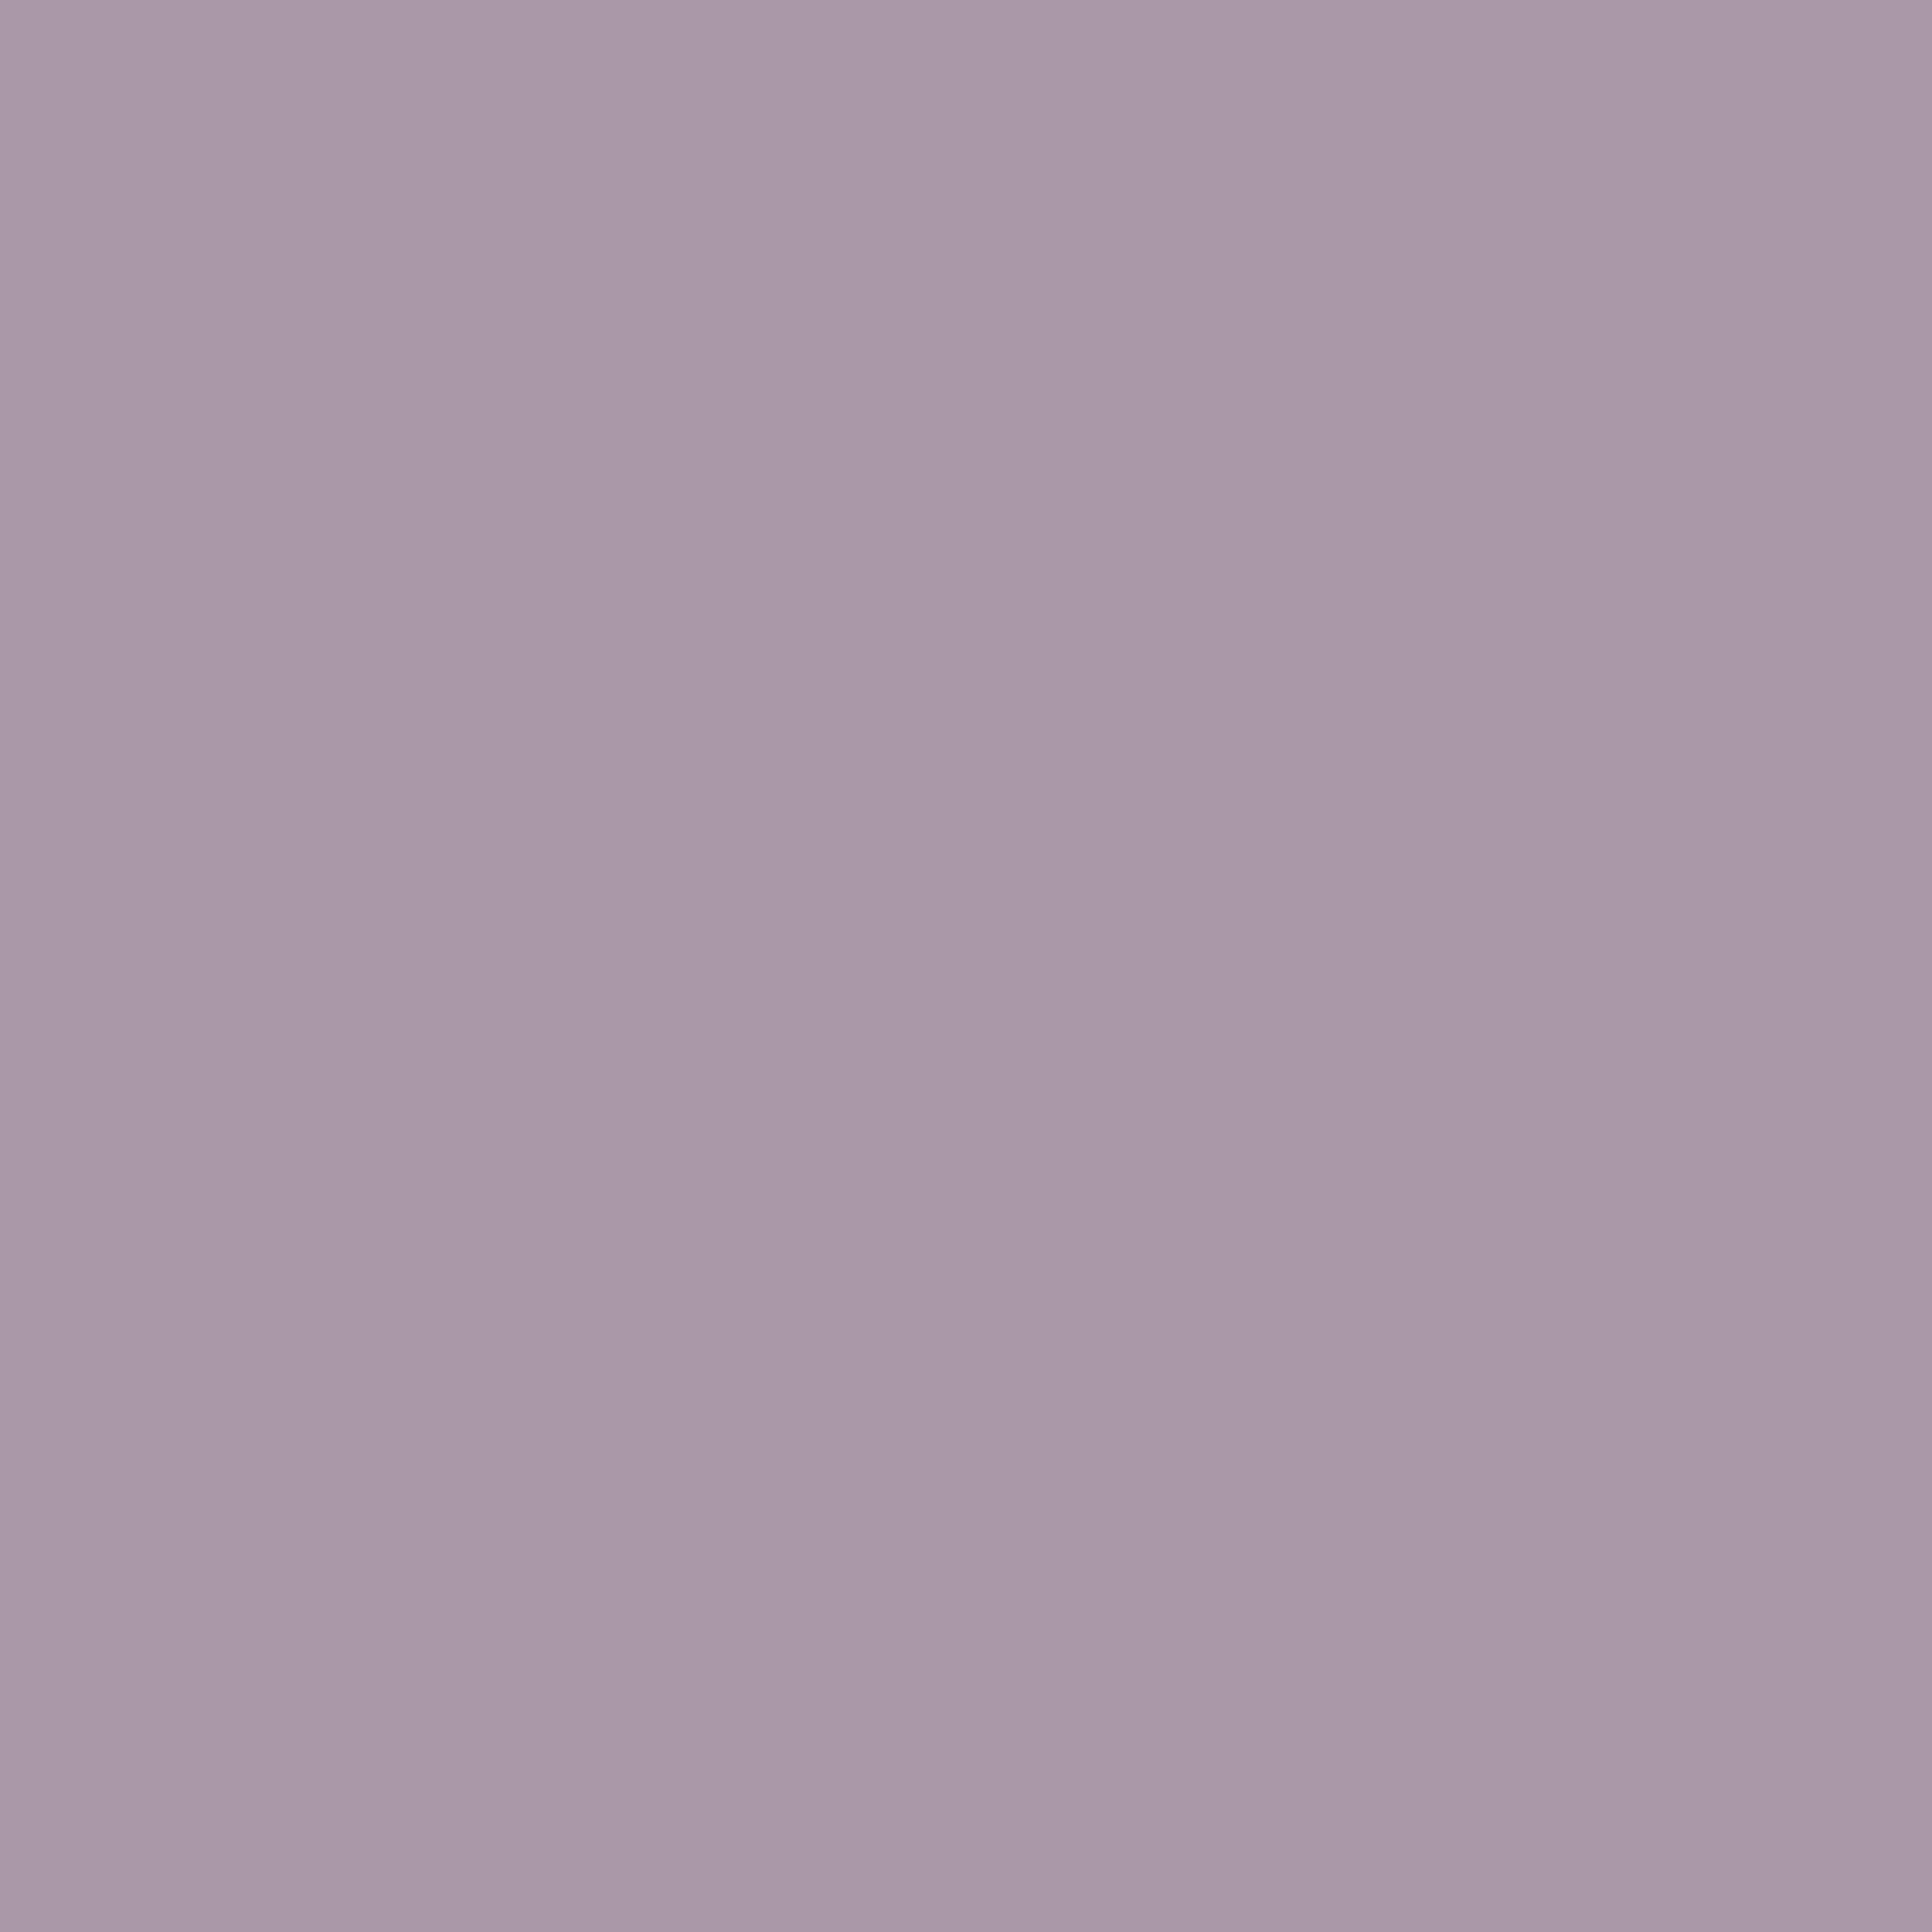 2048x2048 Rose Quartz Solid Color Background